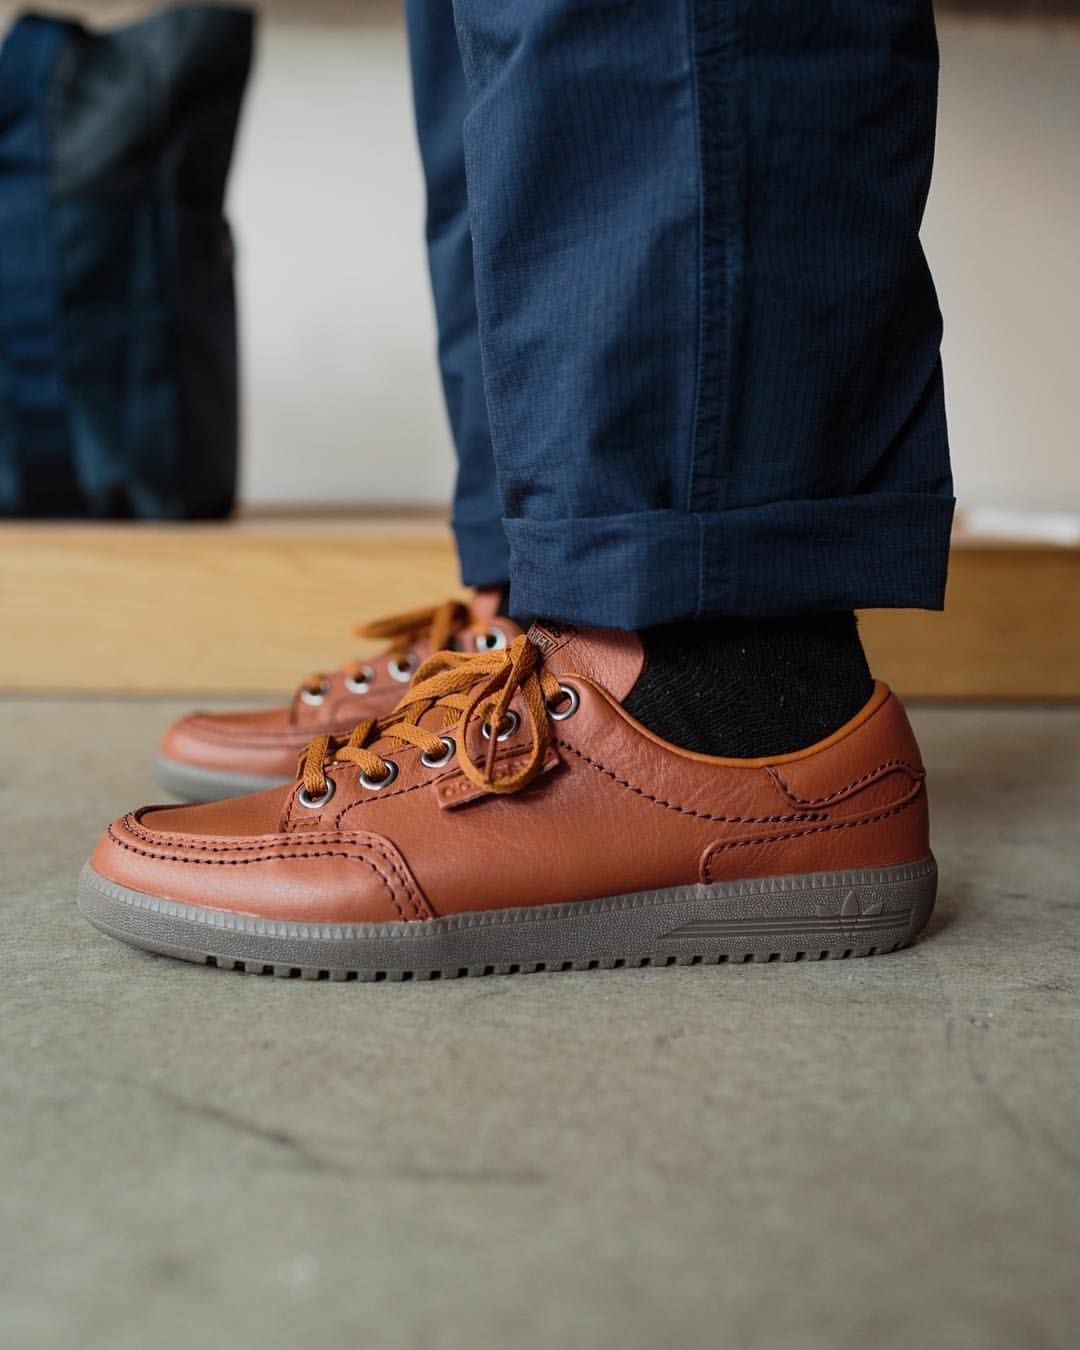 new arrival f2b94 9fc17 Adidas Spezial Garwen | Garwen | Adidas spezial, Sneakers ...